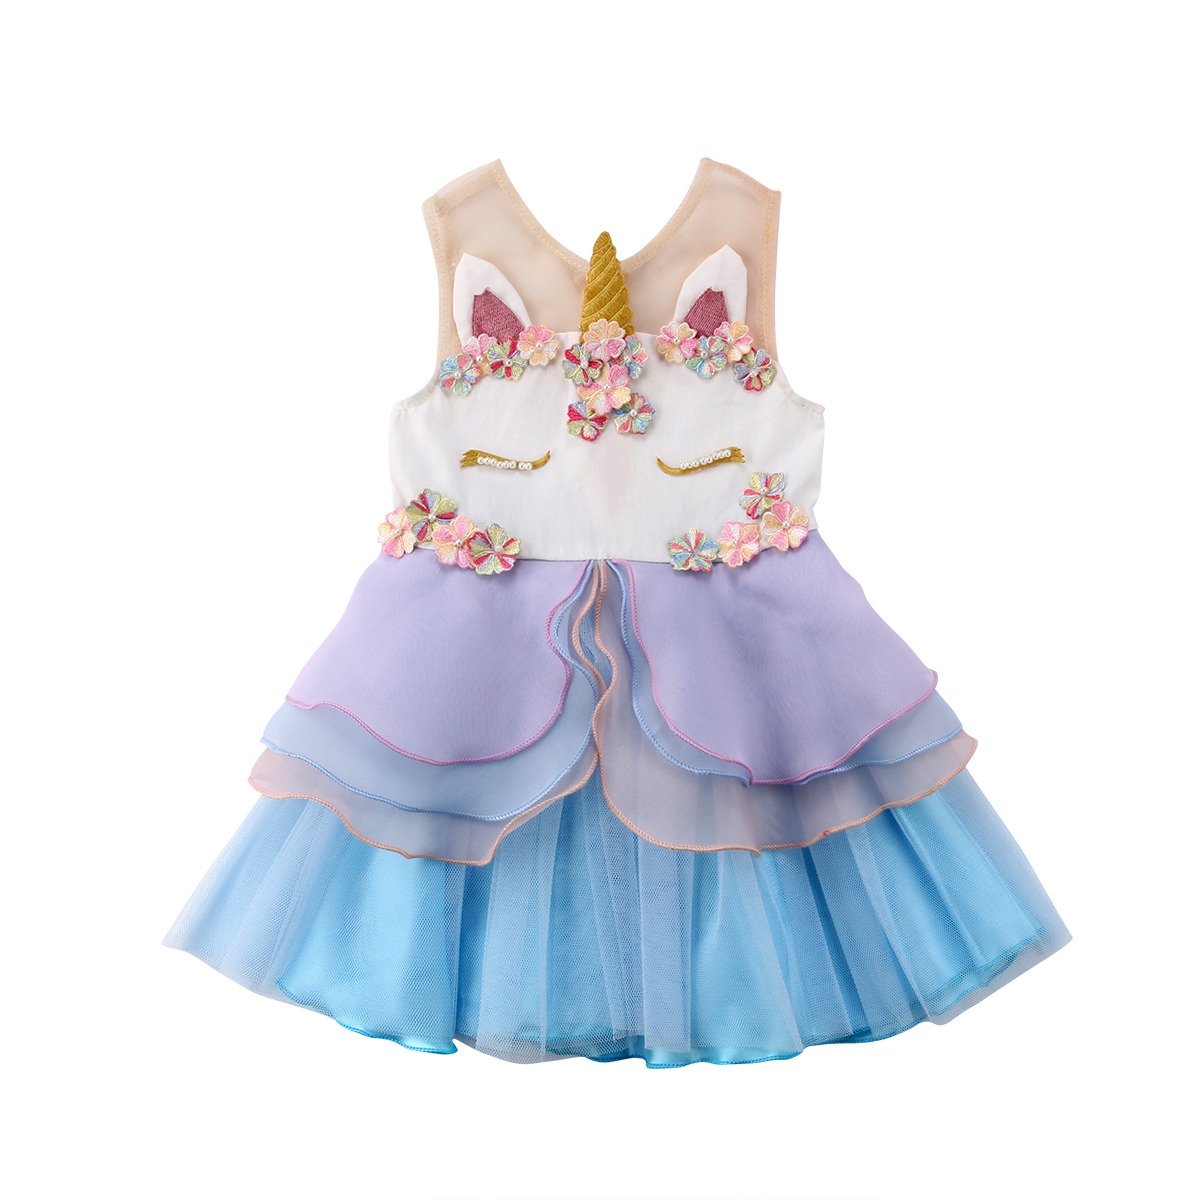 Chiffon Kids Girls Unicorn Dress Sleeveless Ball Gown Princess Luxury Kids  Formal Wedding Dresses-in Dresses from Mother   Kids on Aliexpress.com  b9091ce910b0